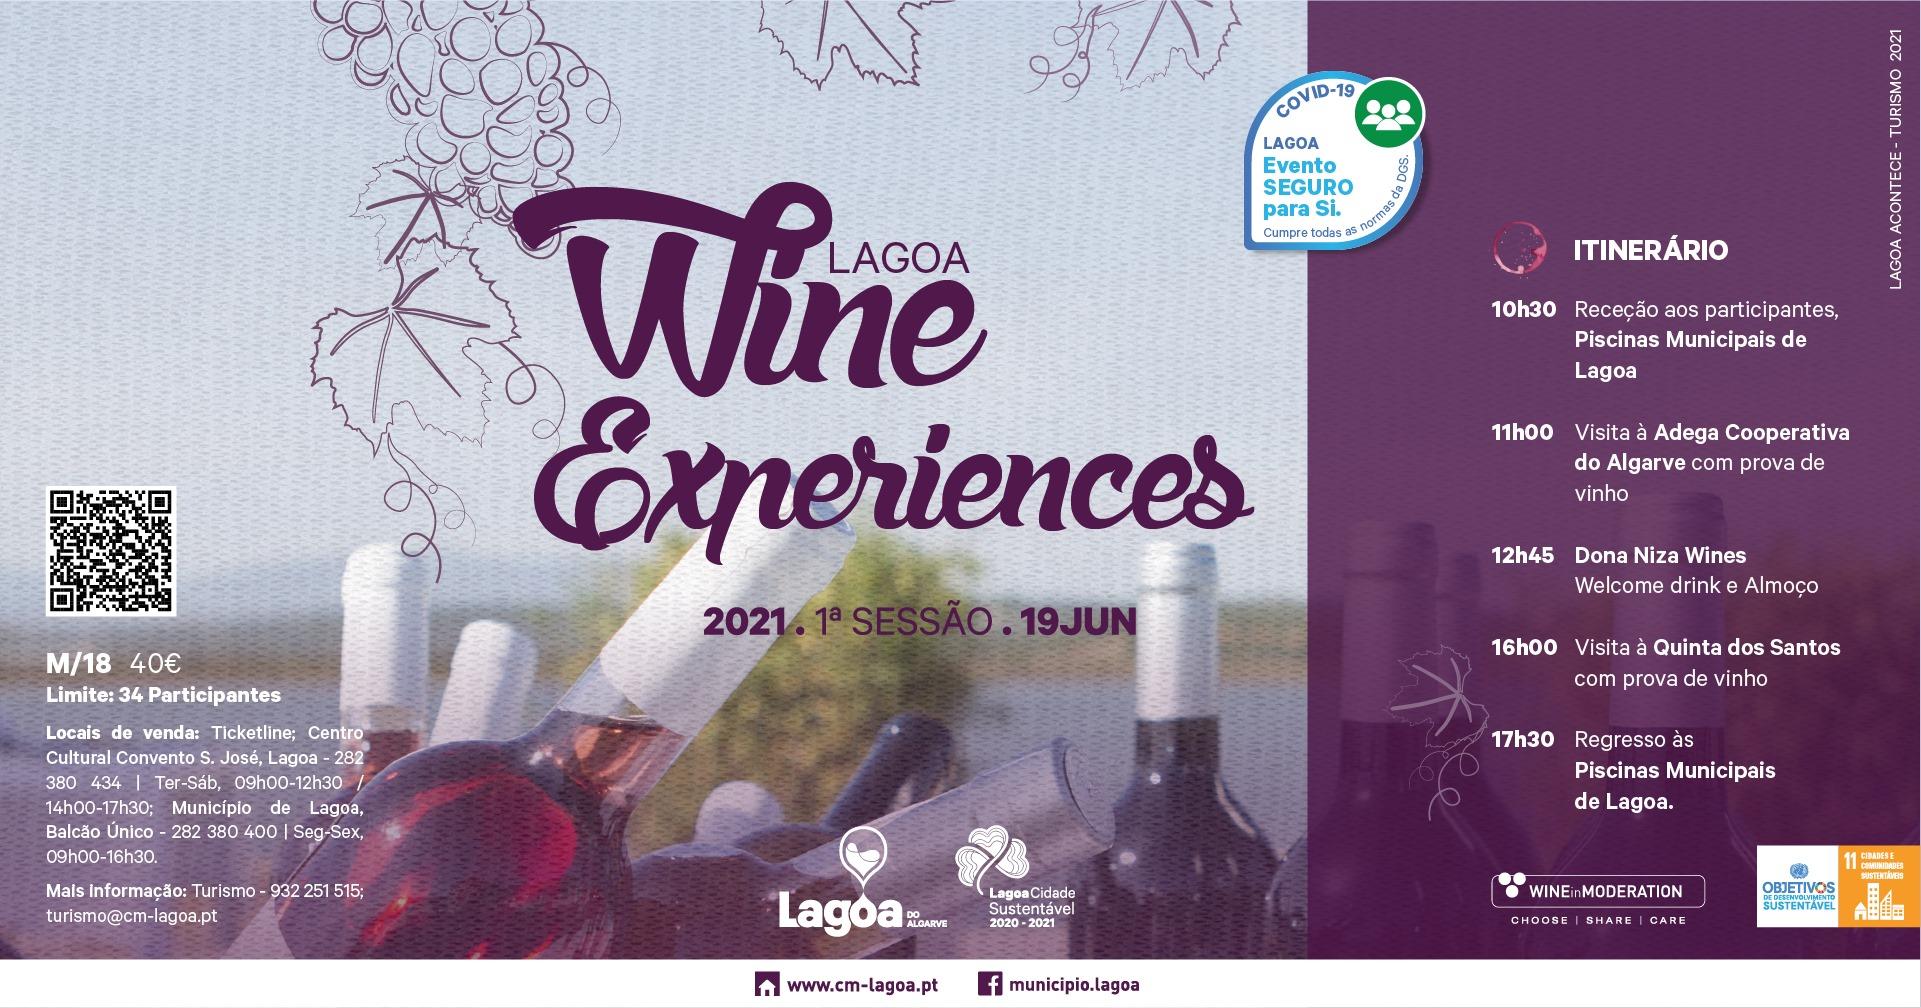 Lagoa Wine Experiences 2021